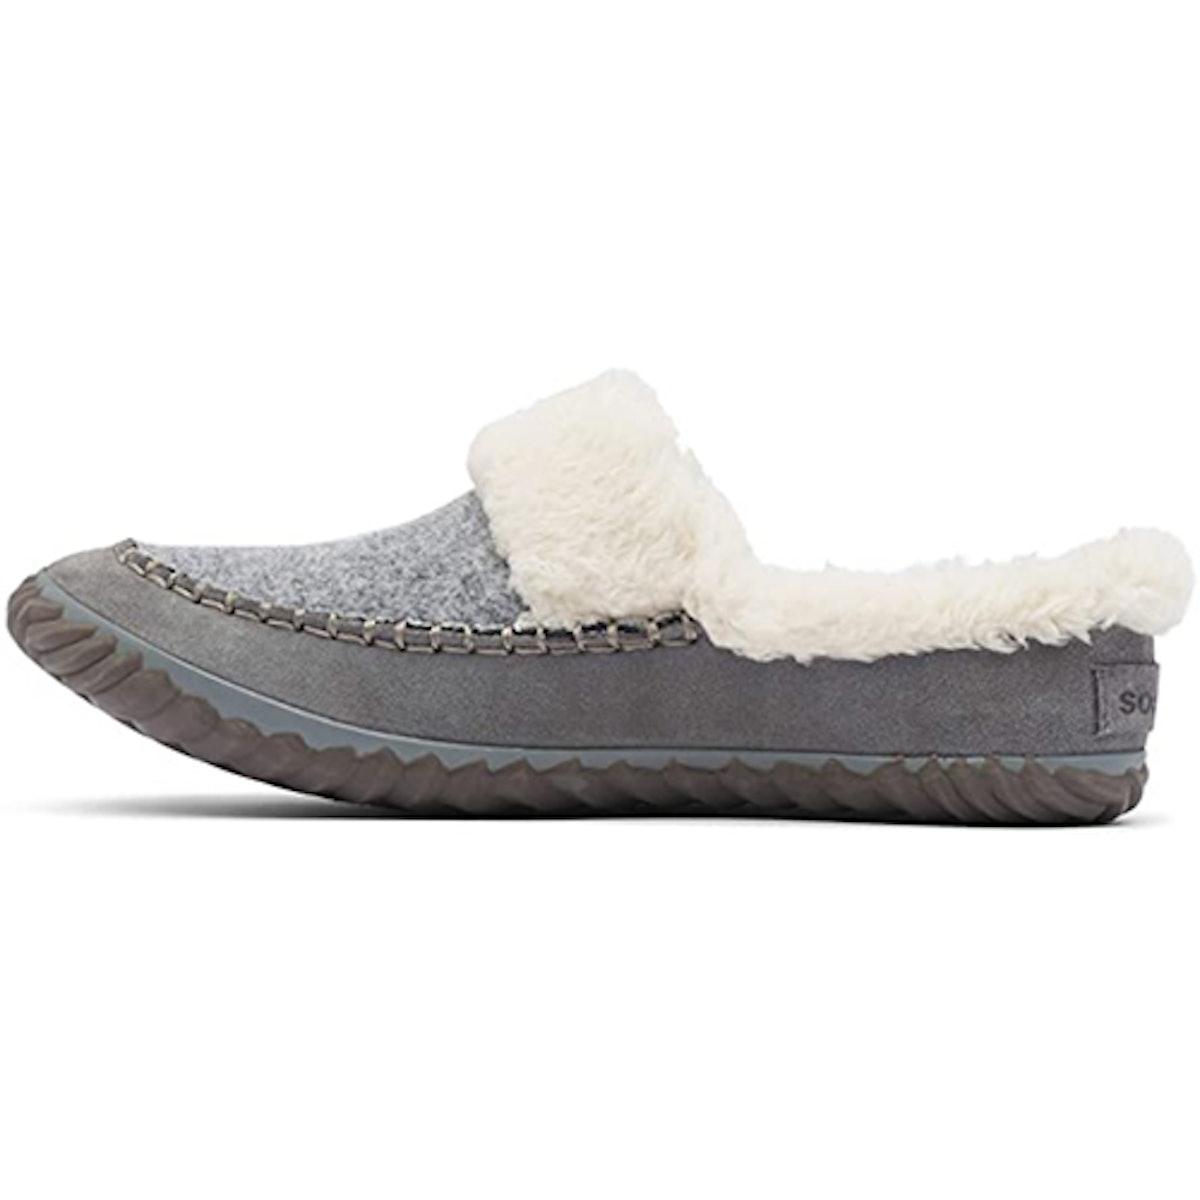 SOREL Out 'N About Slide Slipper